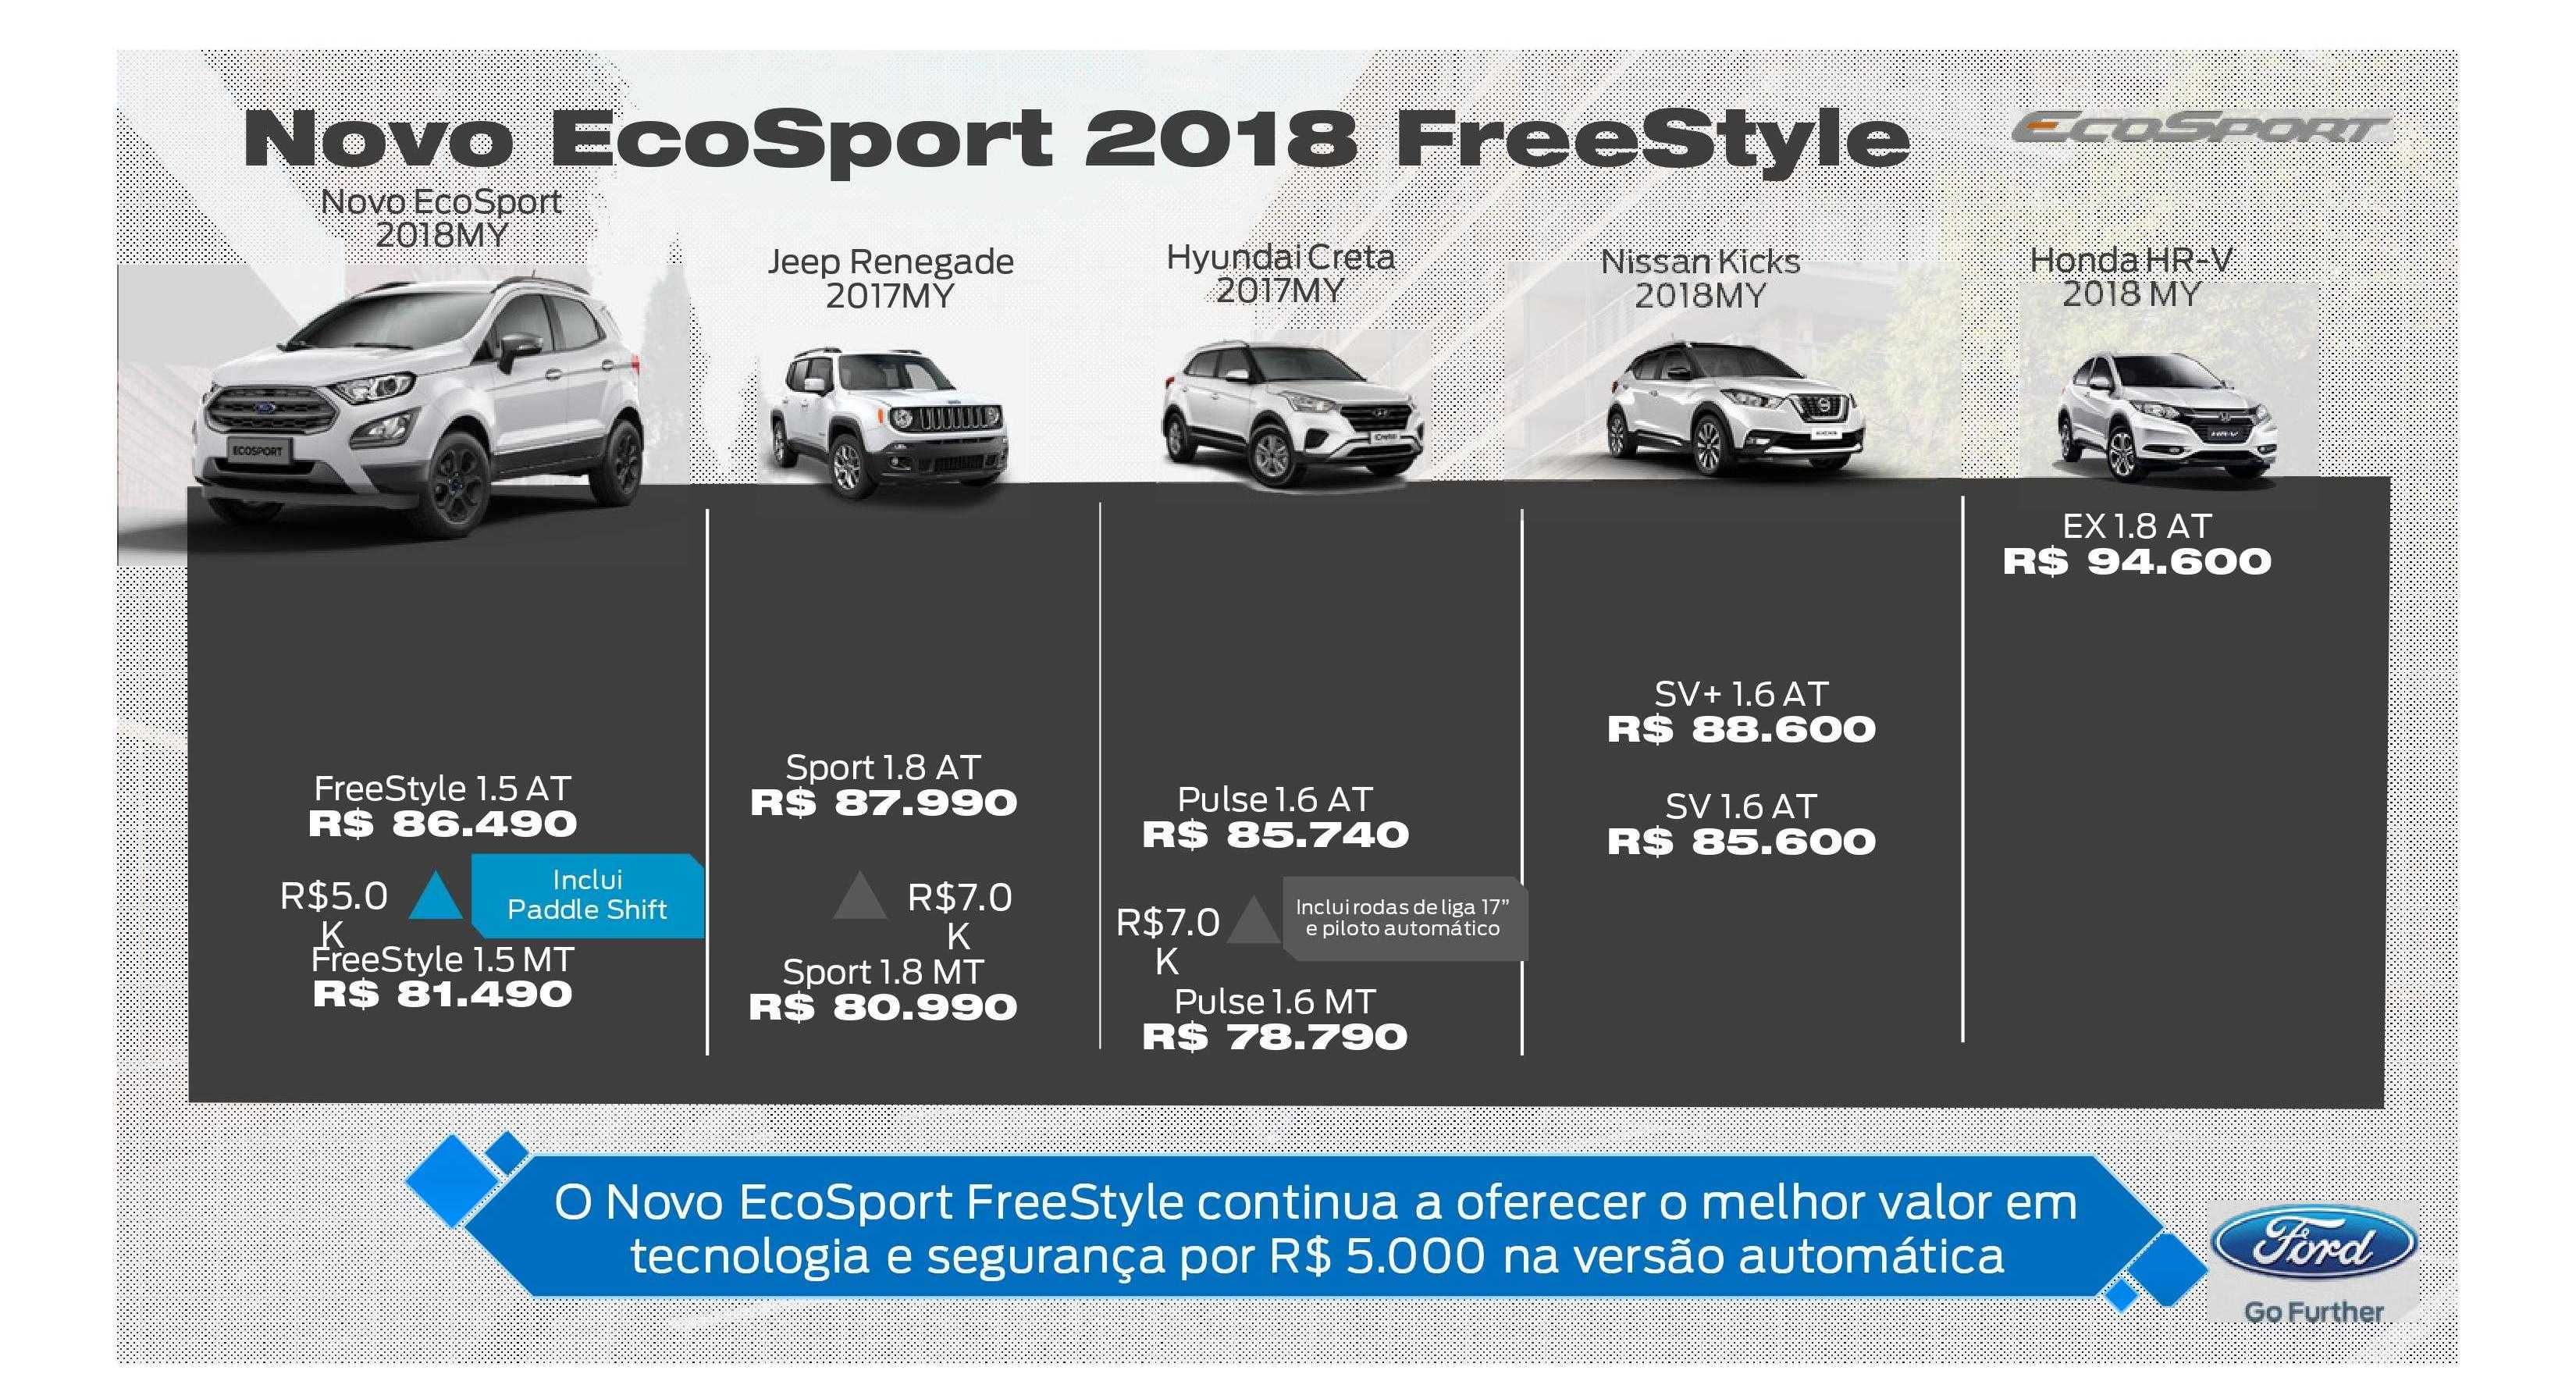 Nova Ecosport